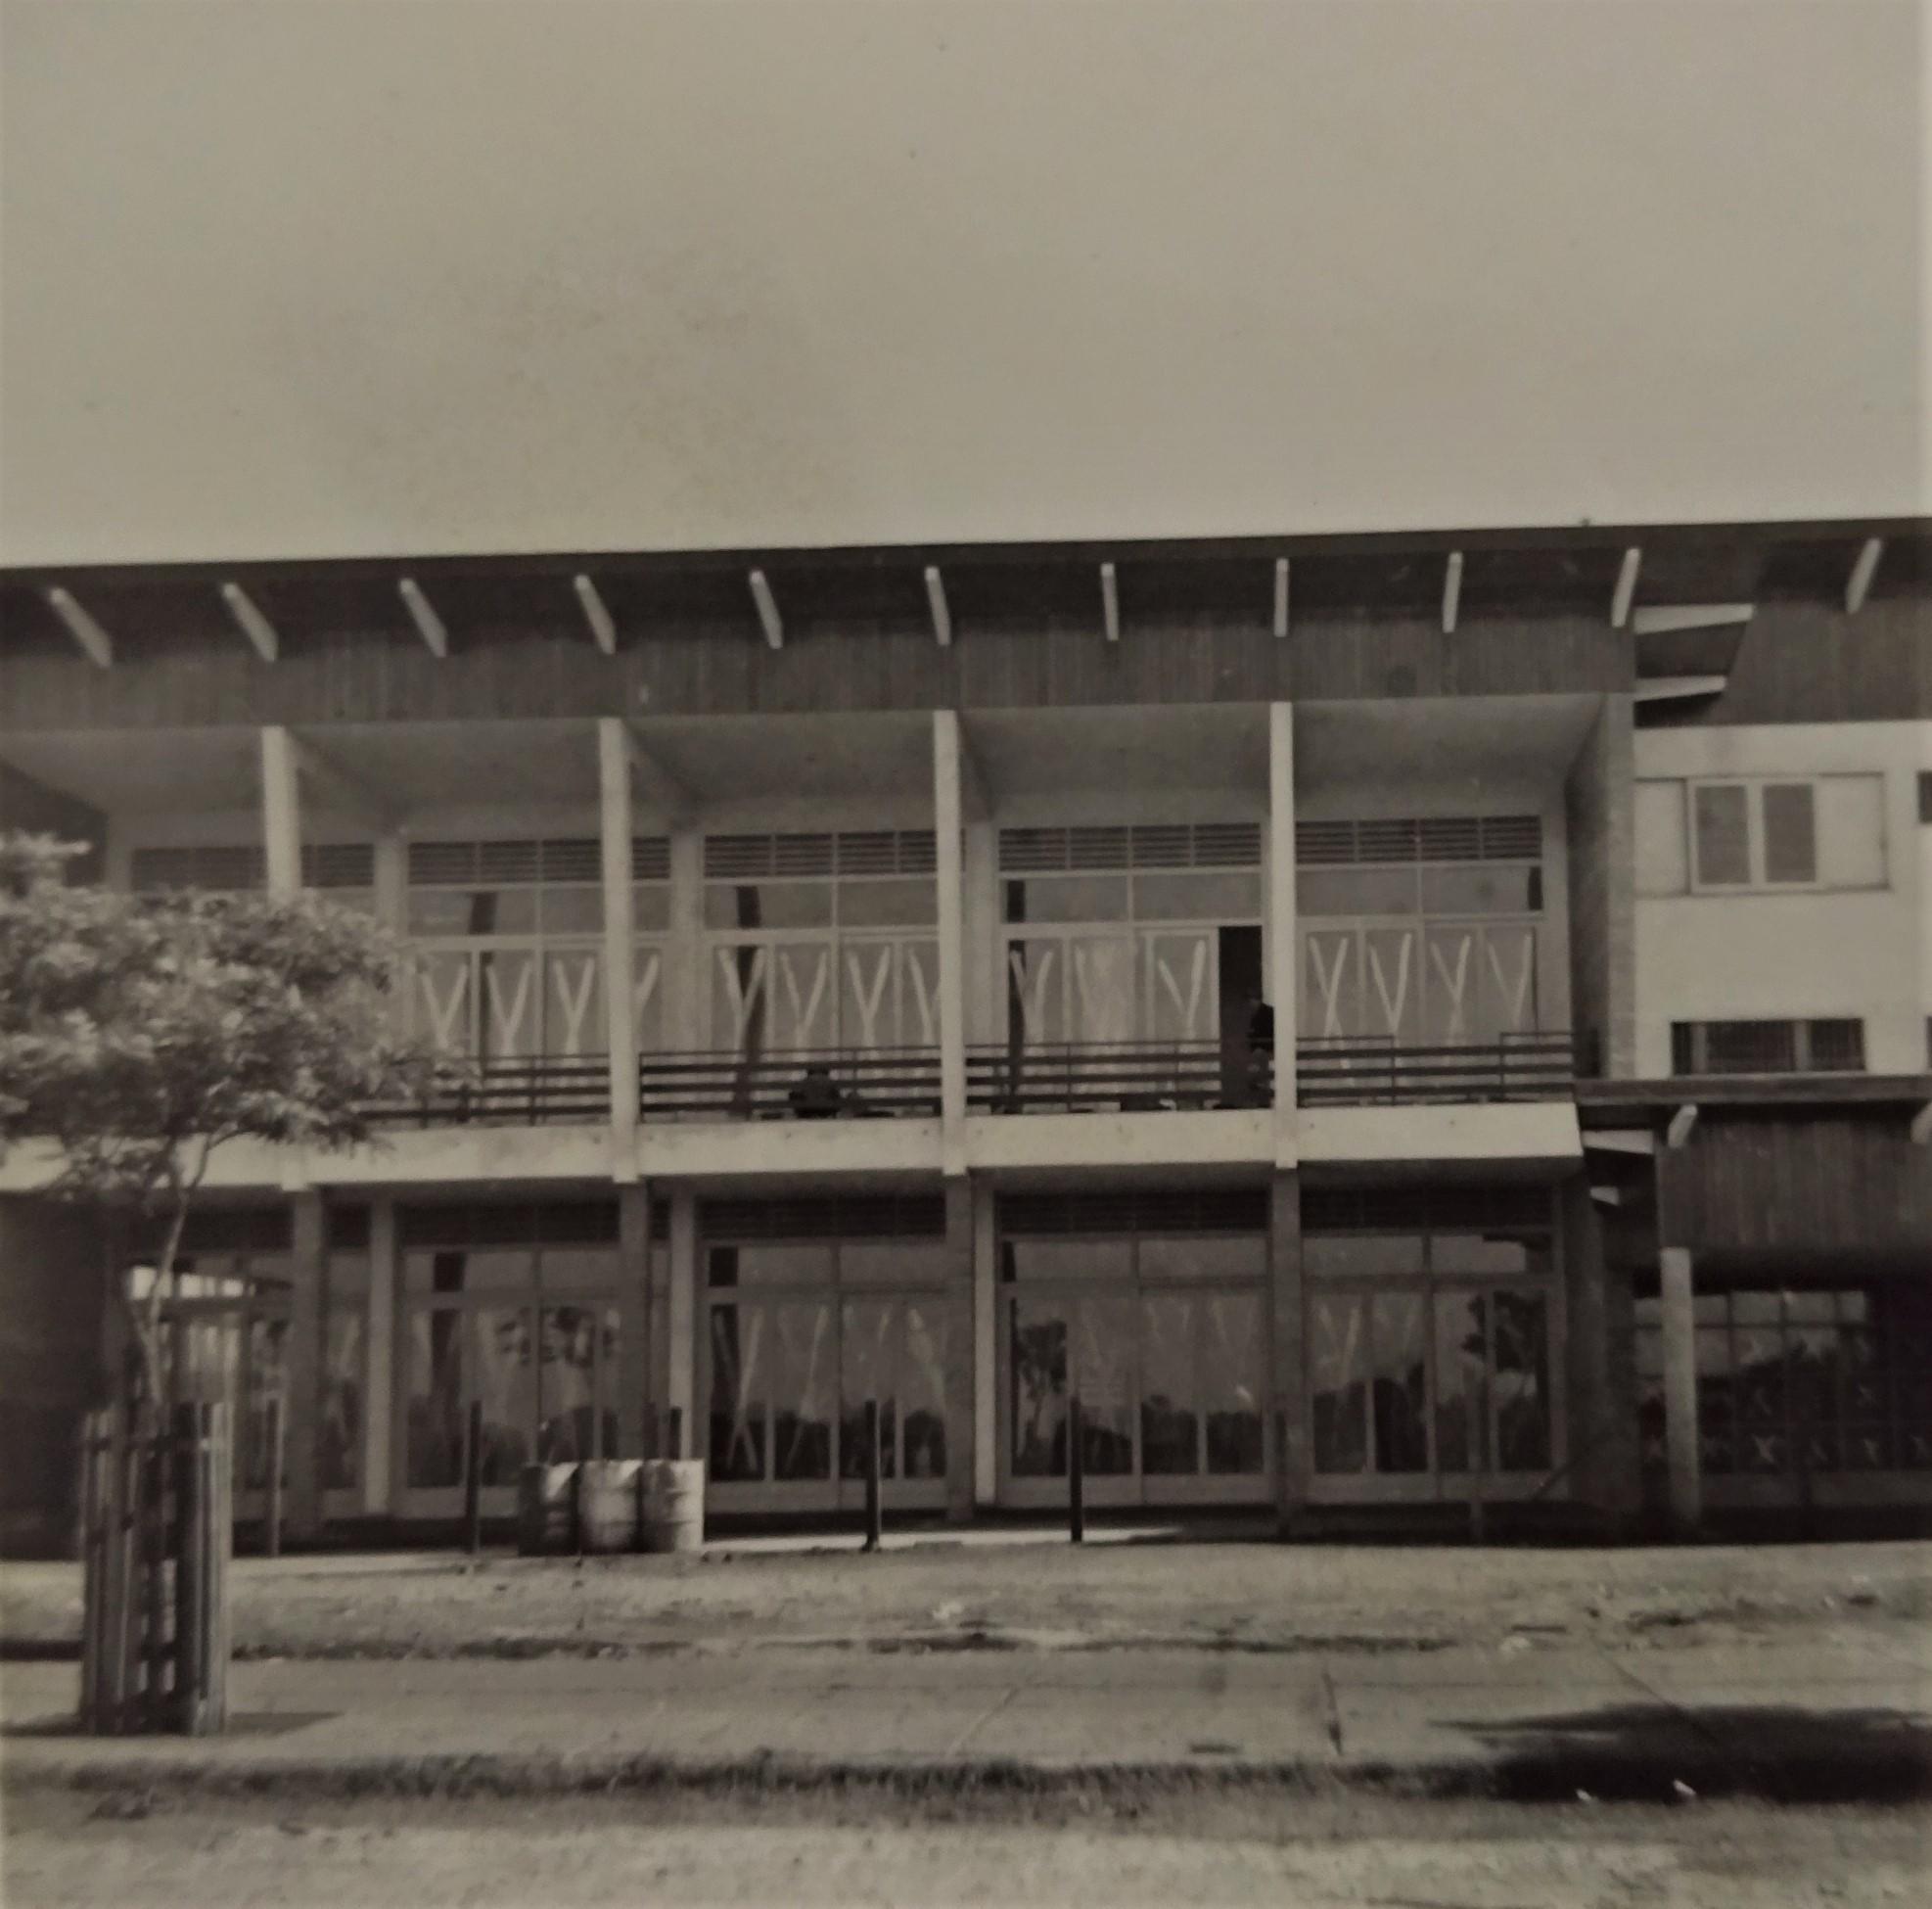 Grande Hotel Maringá - 1956